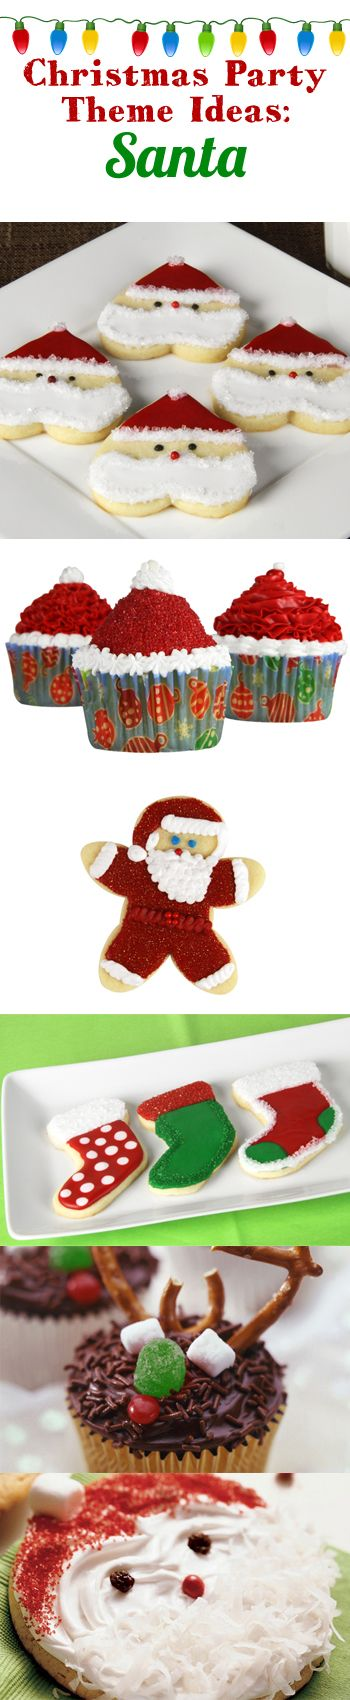 Santa-themed Christmas party desserts!